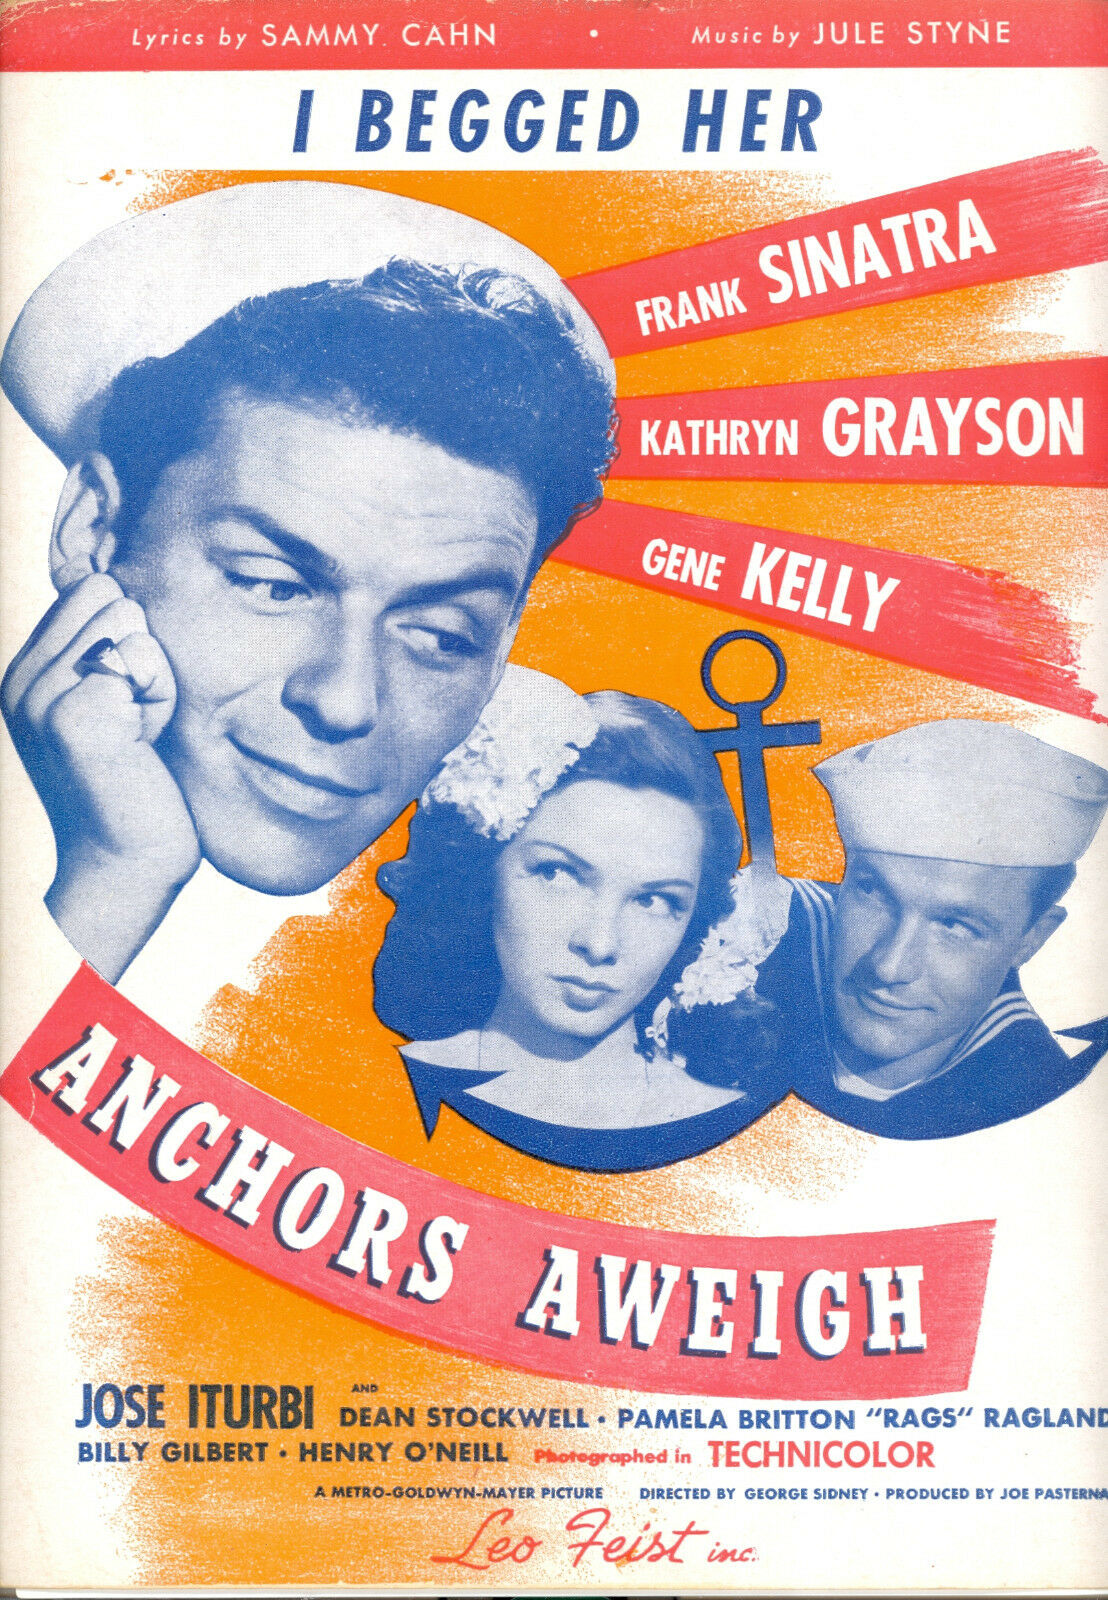 Anchors Aweigh Notenblatt   I'Begged Her   Frank Sinatra Gene Kelly